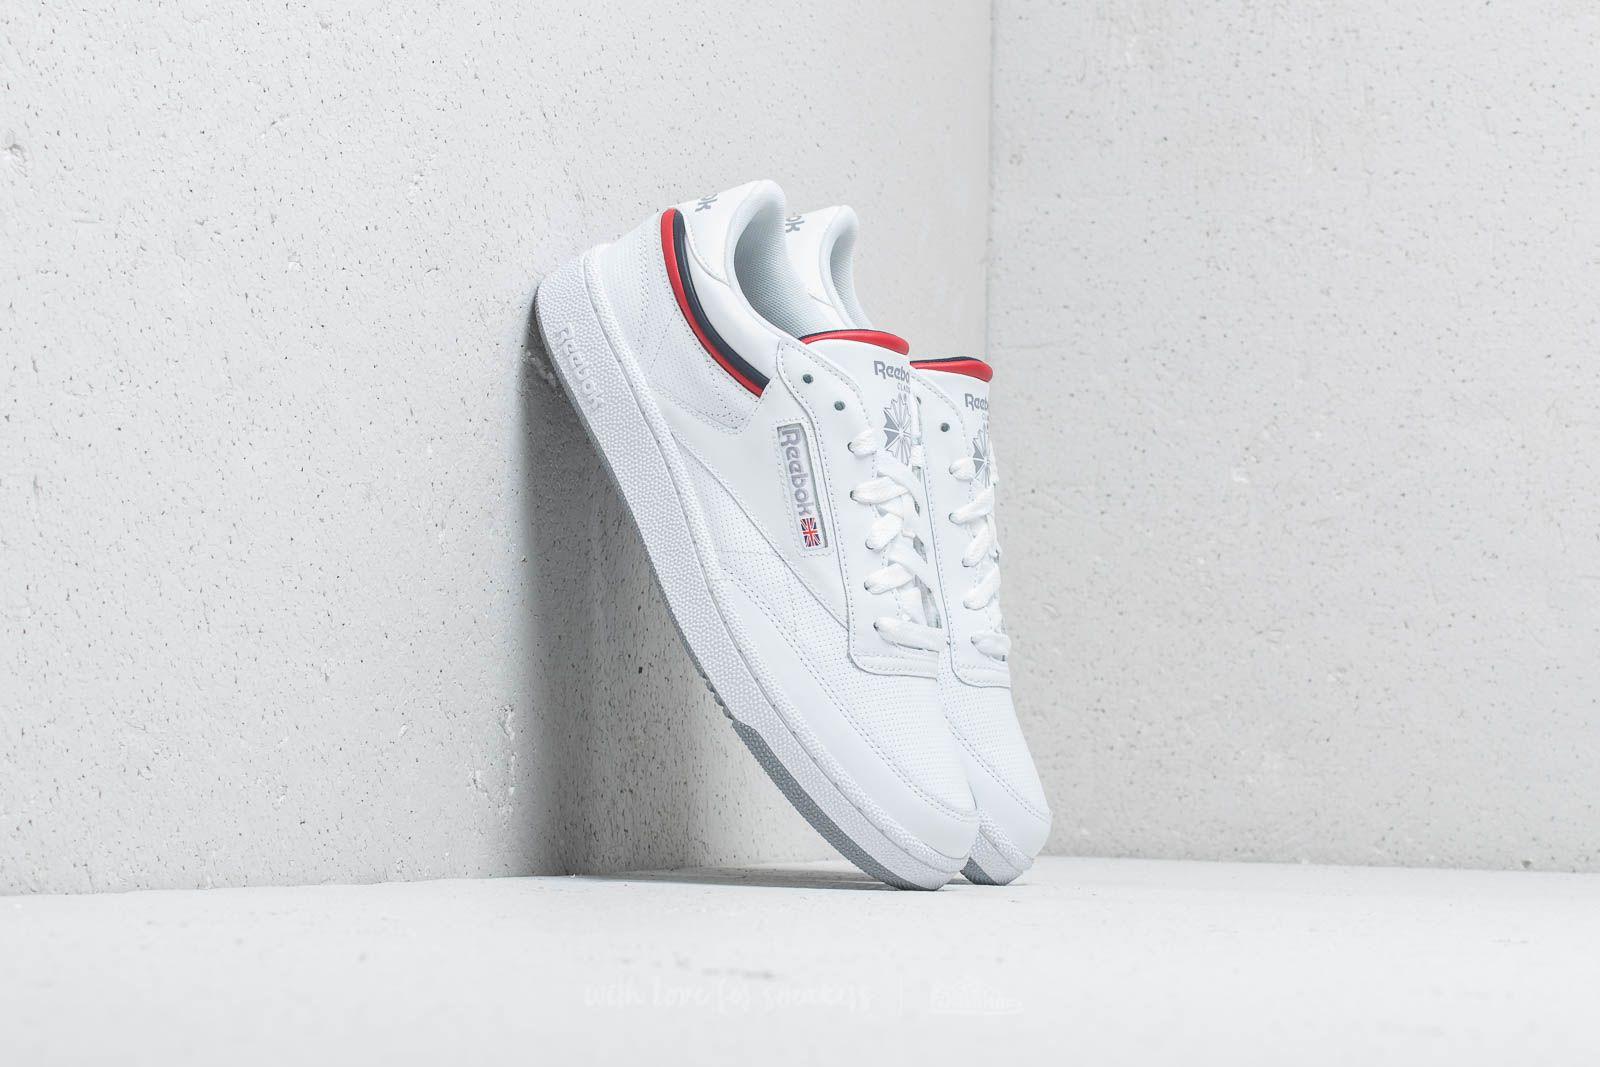 Reebok Club C 85 MU White/ Navy/ Red/ Shadow za skvělou cenu 1 880 Kč koupíte na Footshop.cz